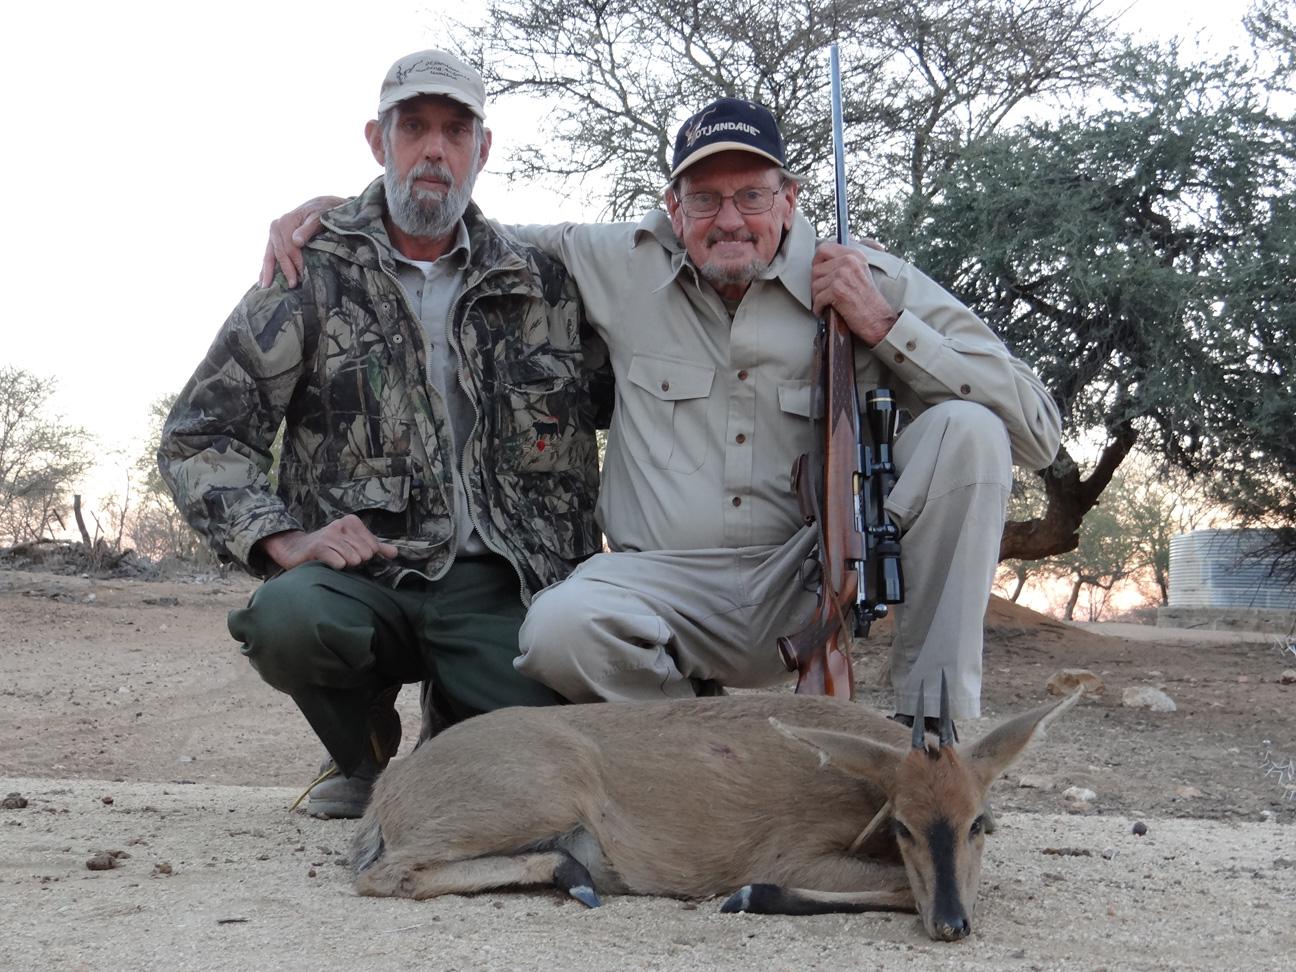 JC Morris - USA Trophy Hunting Namibia